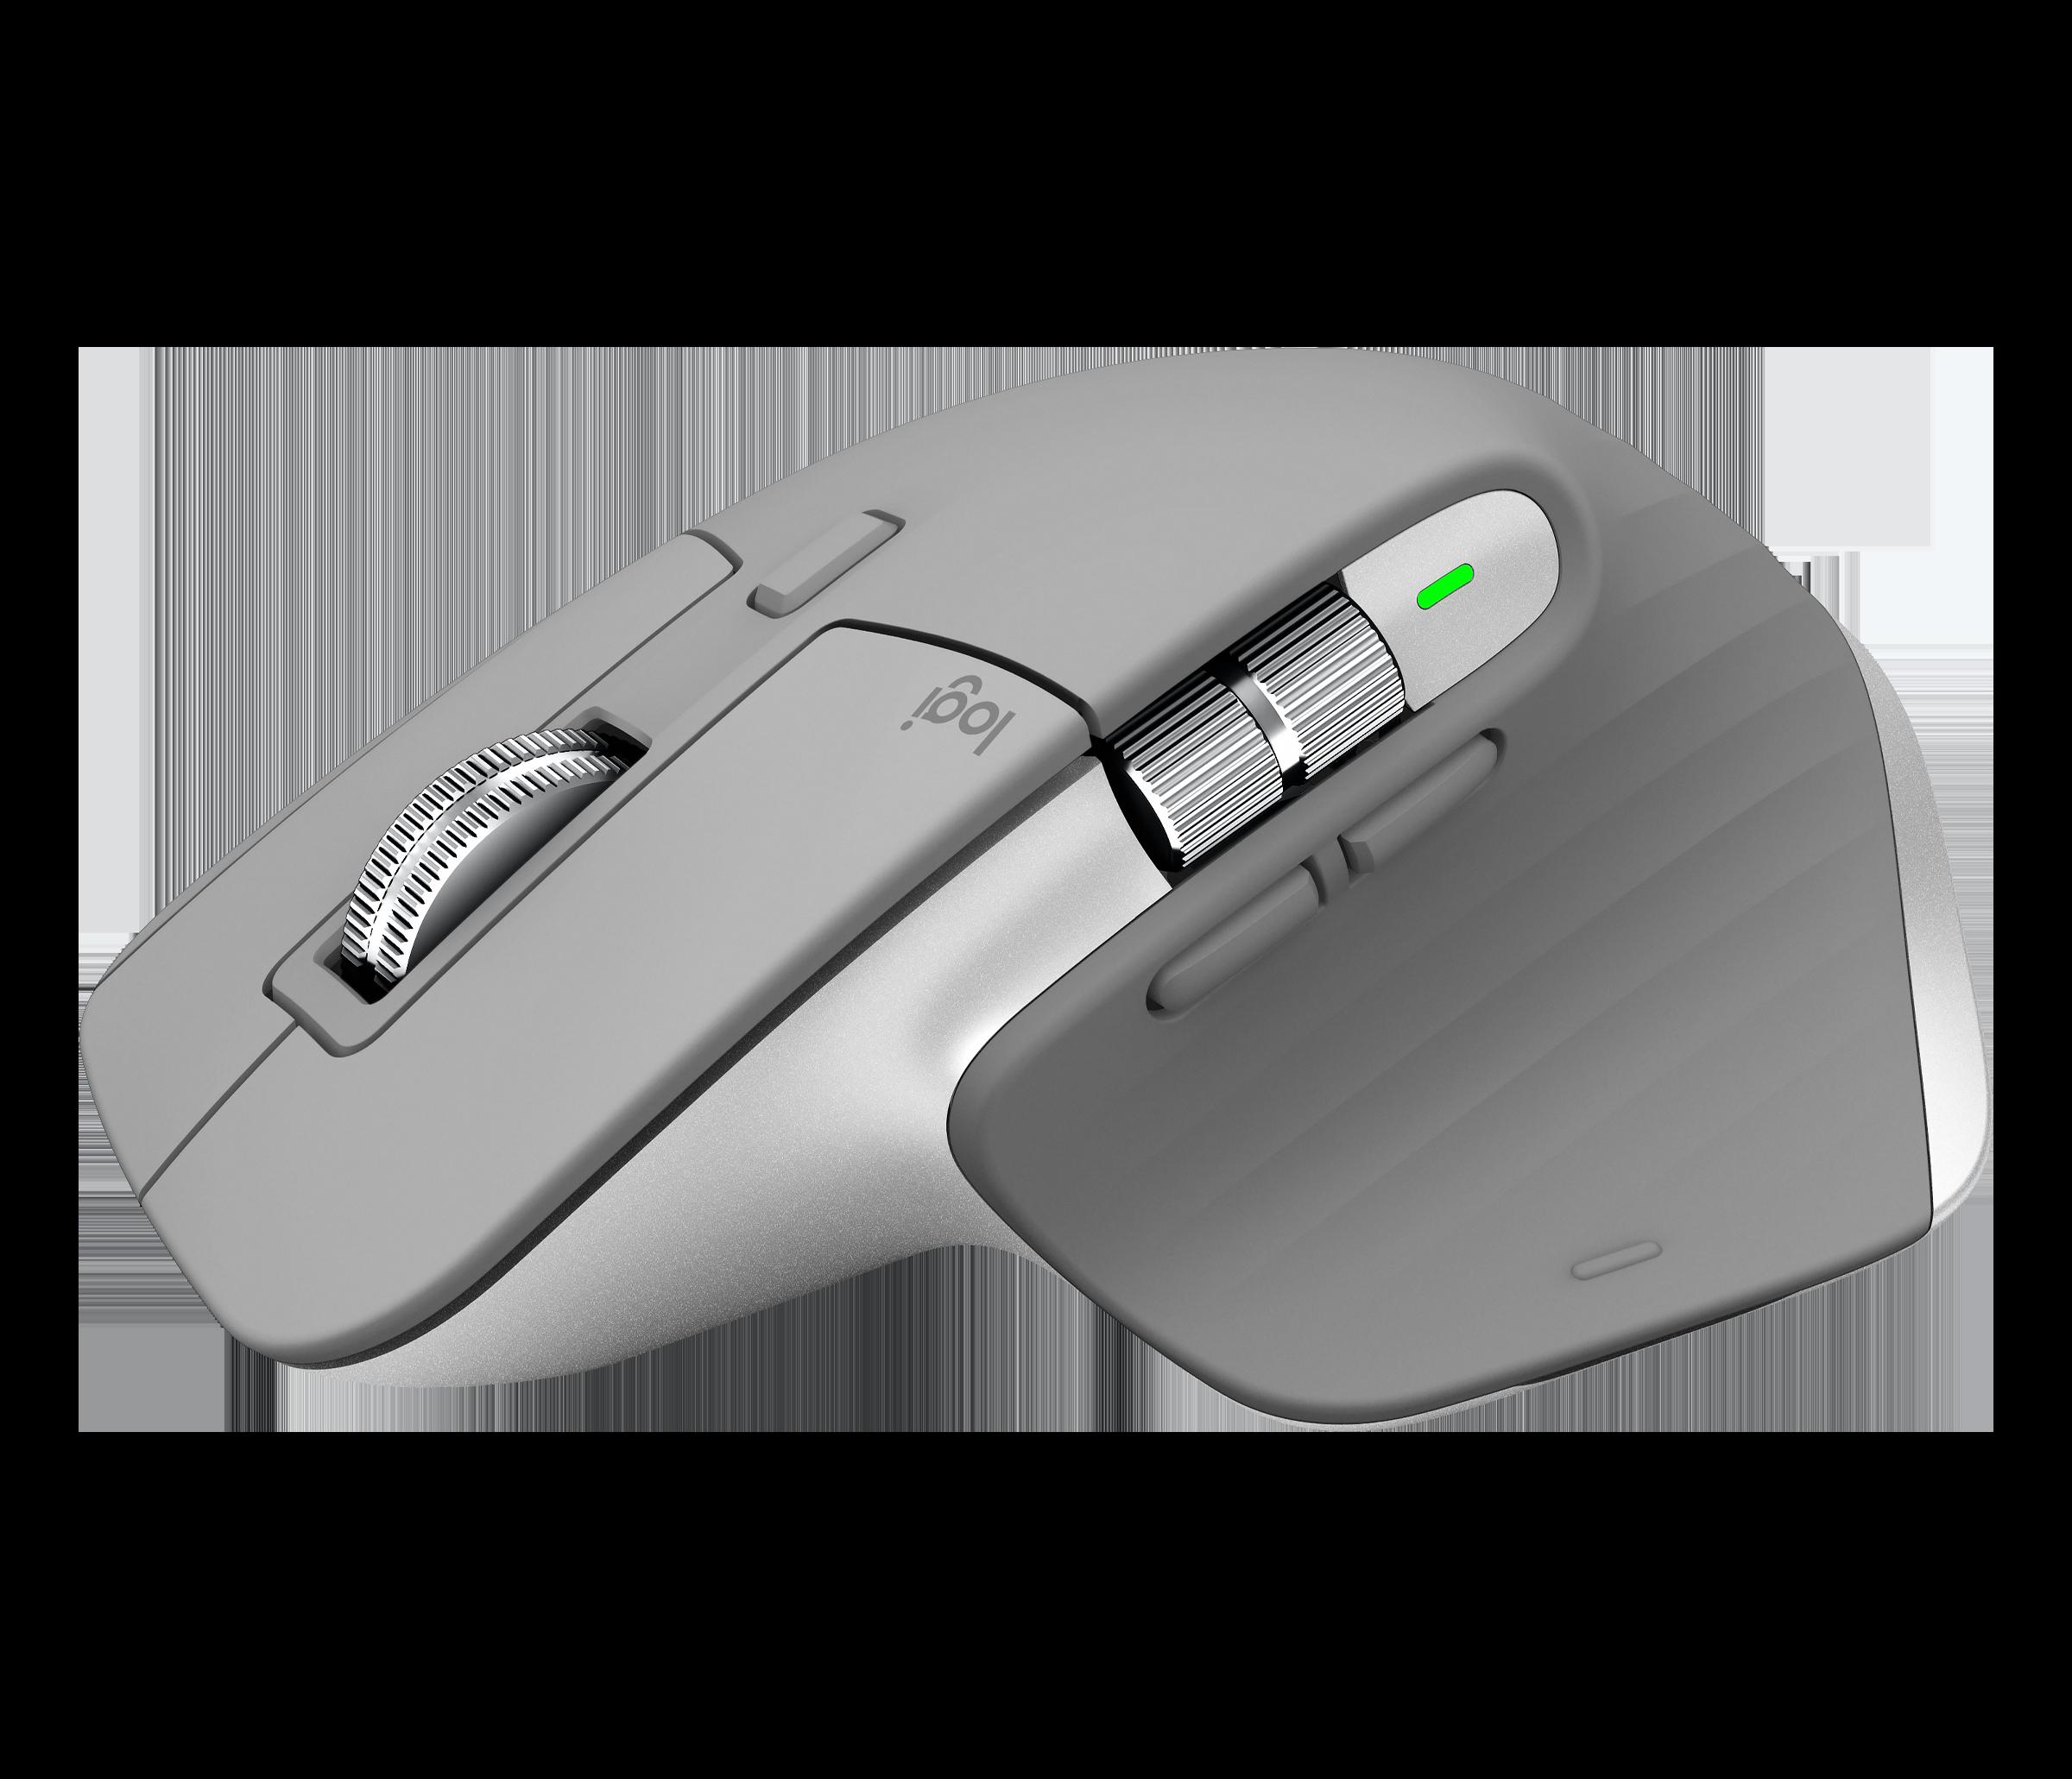 Logitech Mx Master 3 Wireless Mouse With Hyper Fast Scroll Wheel